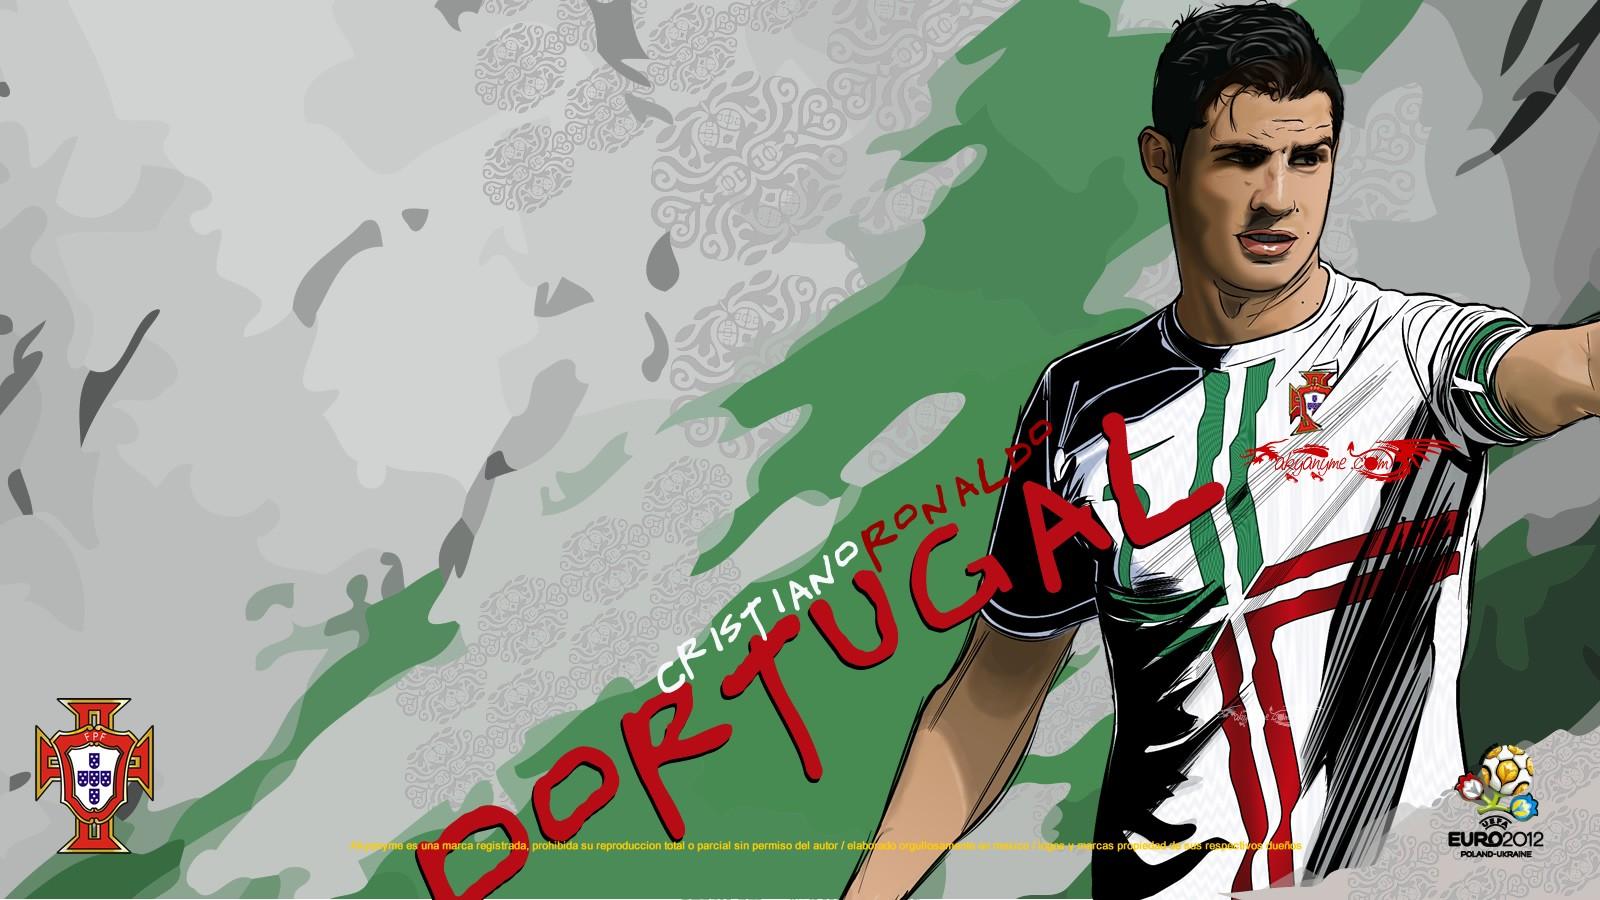 soccer cristiano ronaldo hd wallpapers, desktop backgrounds 1600x900